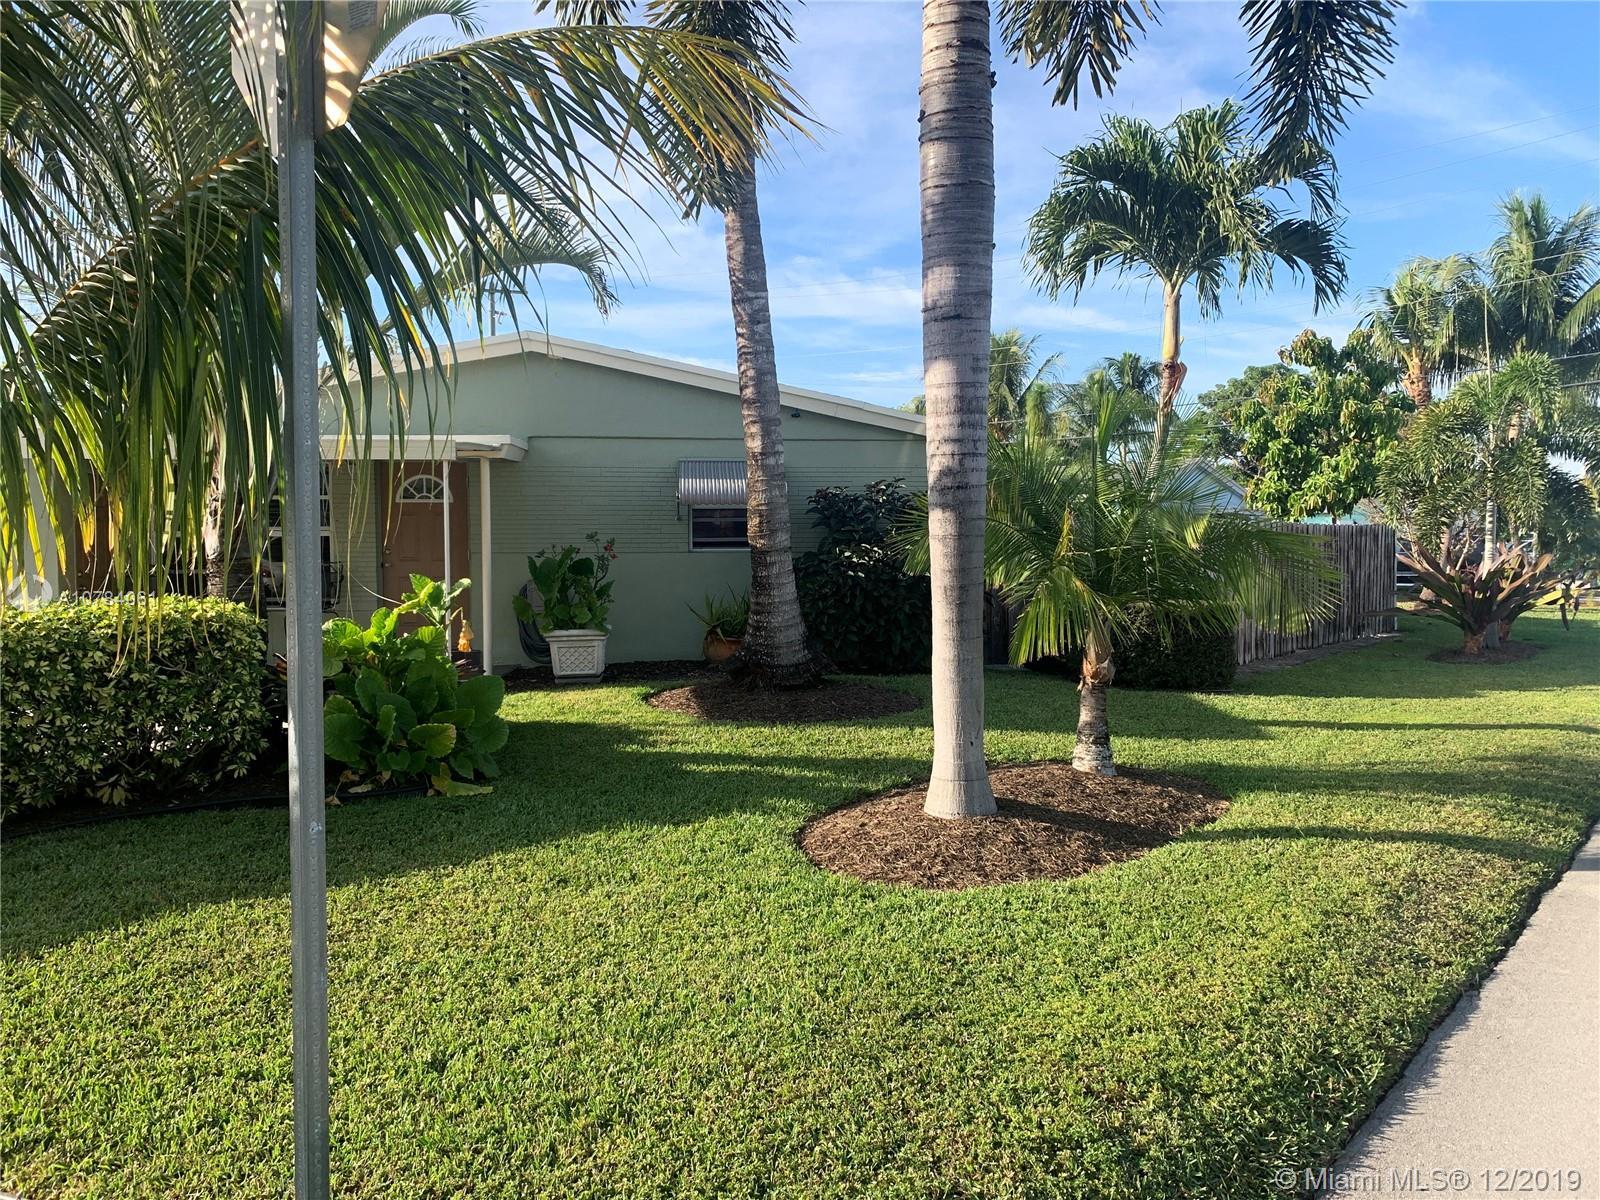 4415 SW 49th Ct, Dania Beach, FL 33314